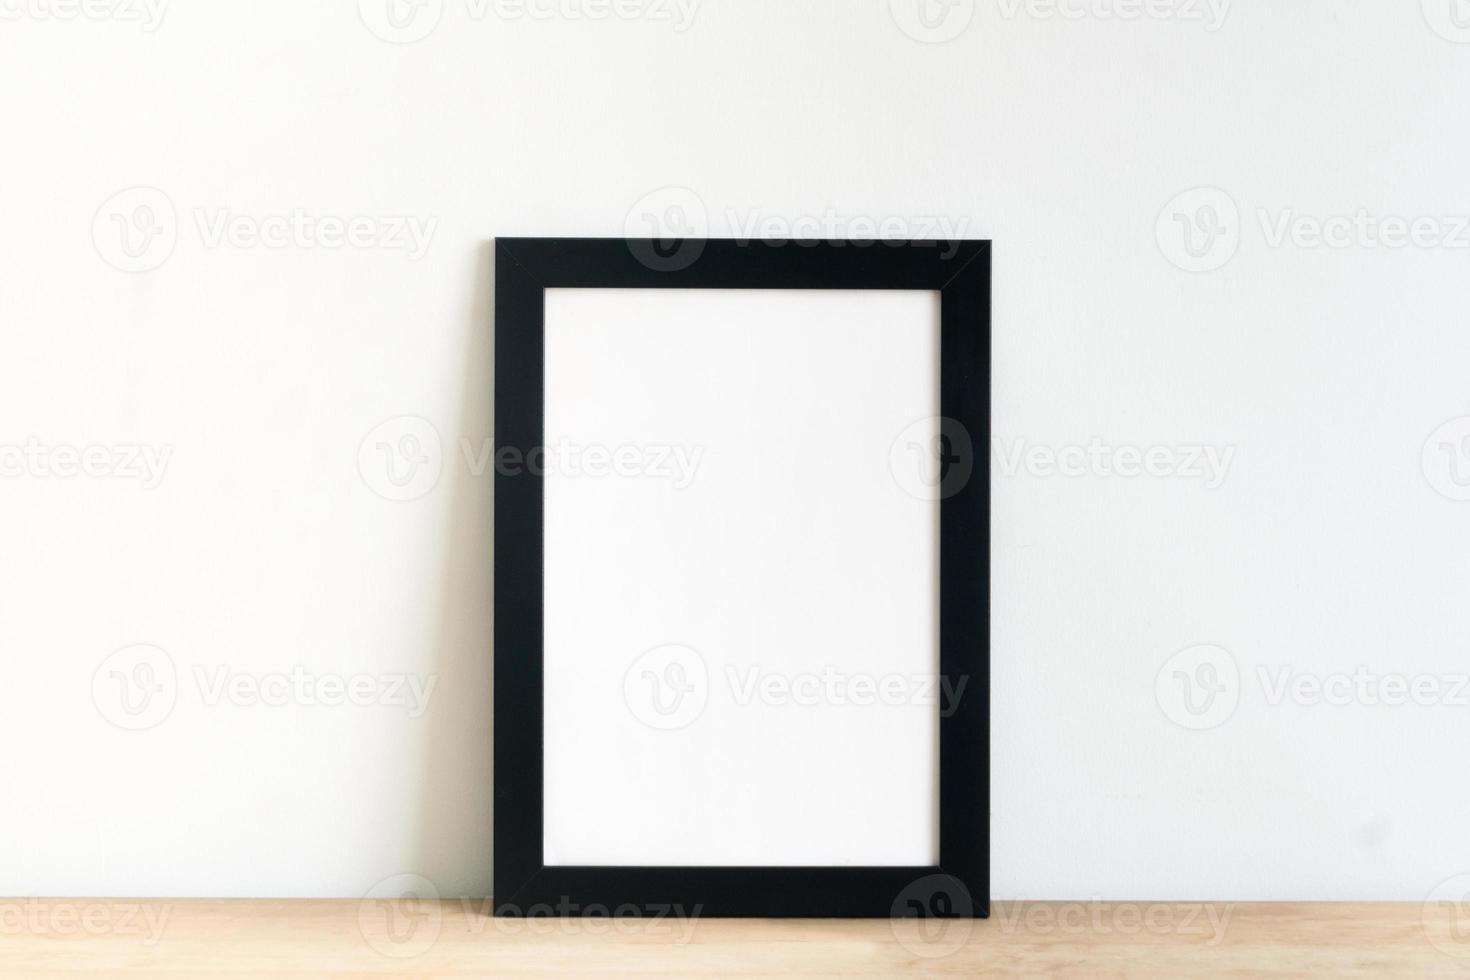 cornice nera vuota su sfondo bianco interno foto